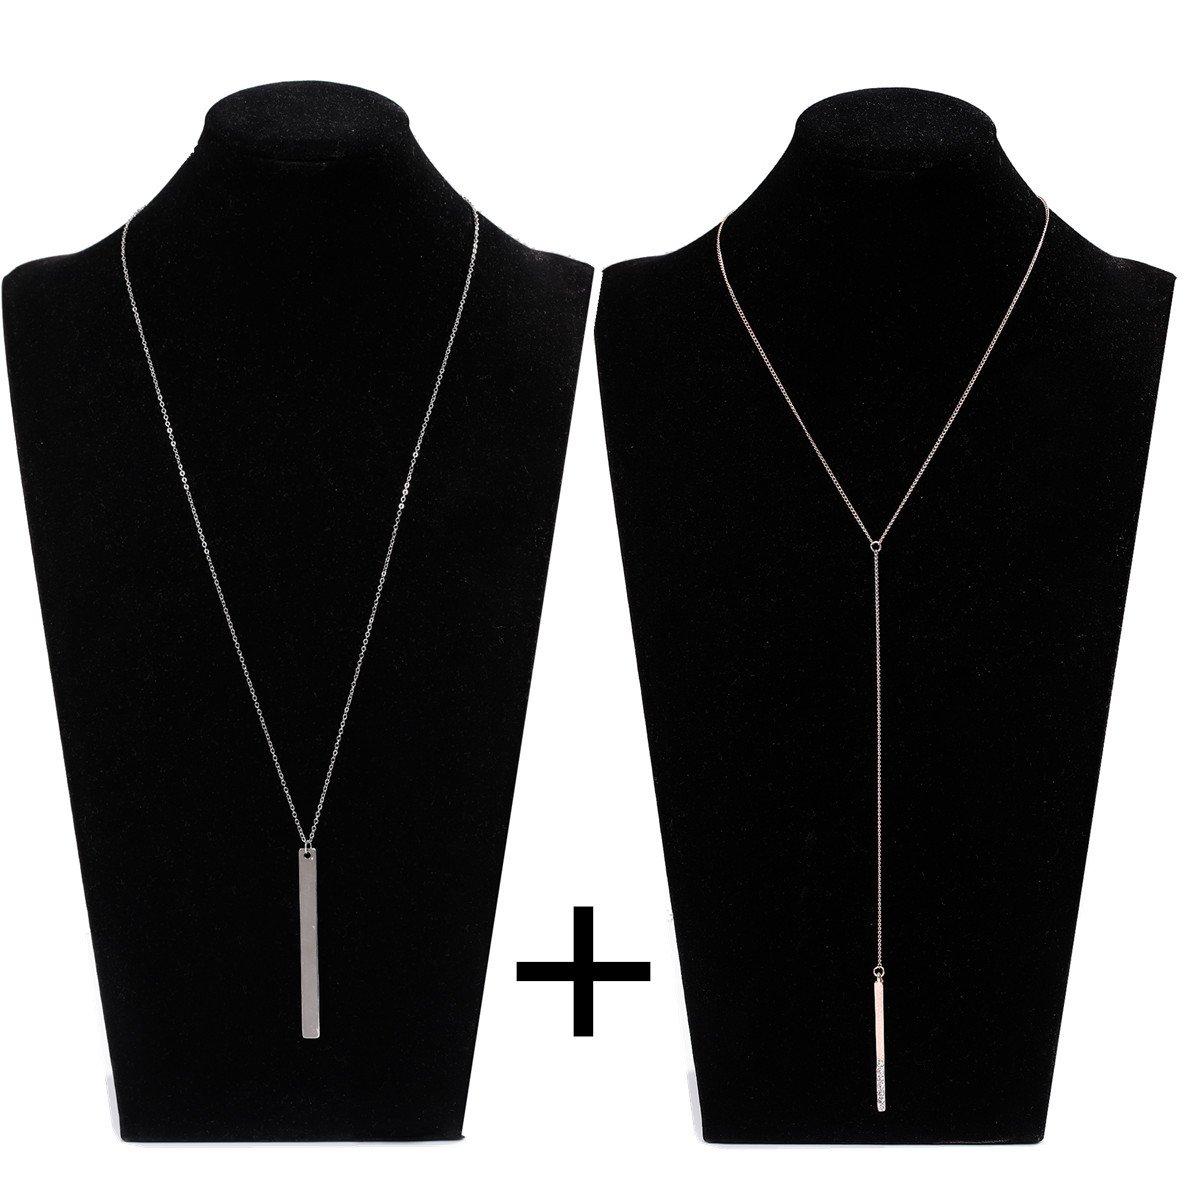 Long Chain Beaded Tassel Necklace - Bar Tassel Drop Sweater Chain Pendant Y Necklaces for Women YOUMI B07DPKDTYL_US